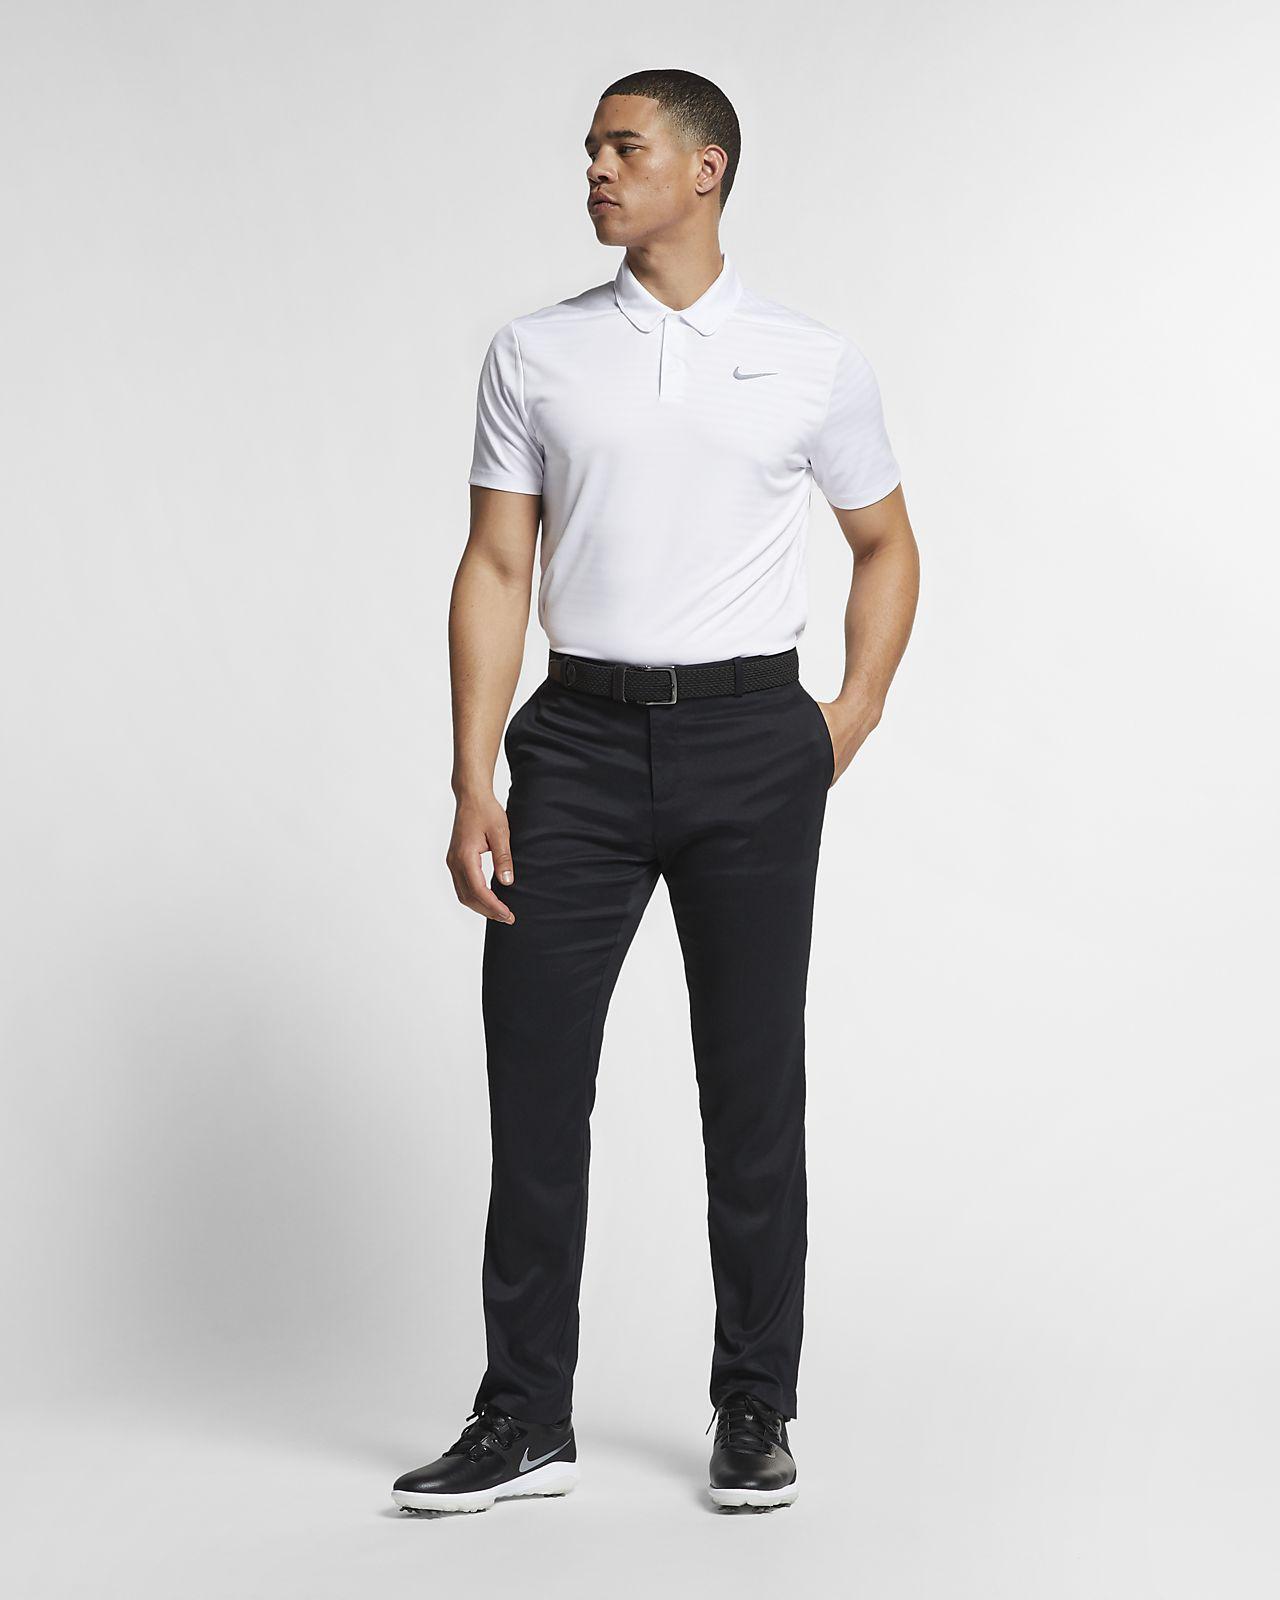 pantalon de golf homme nike